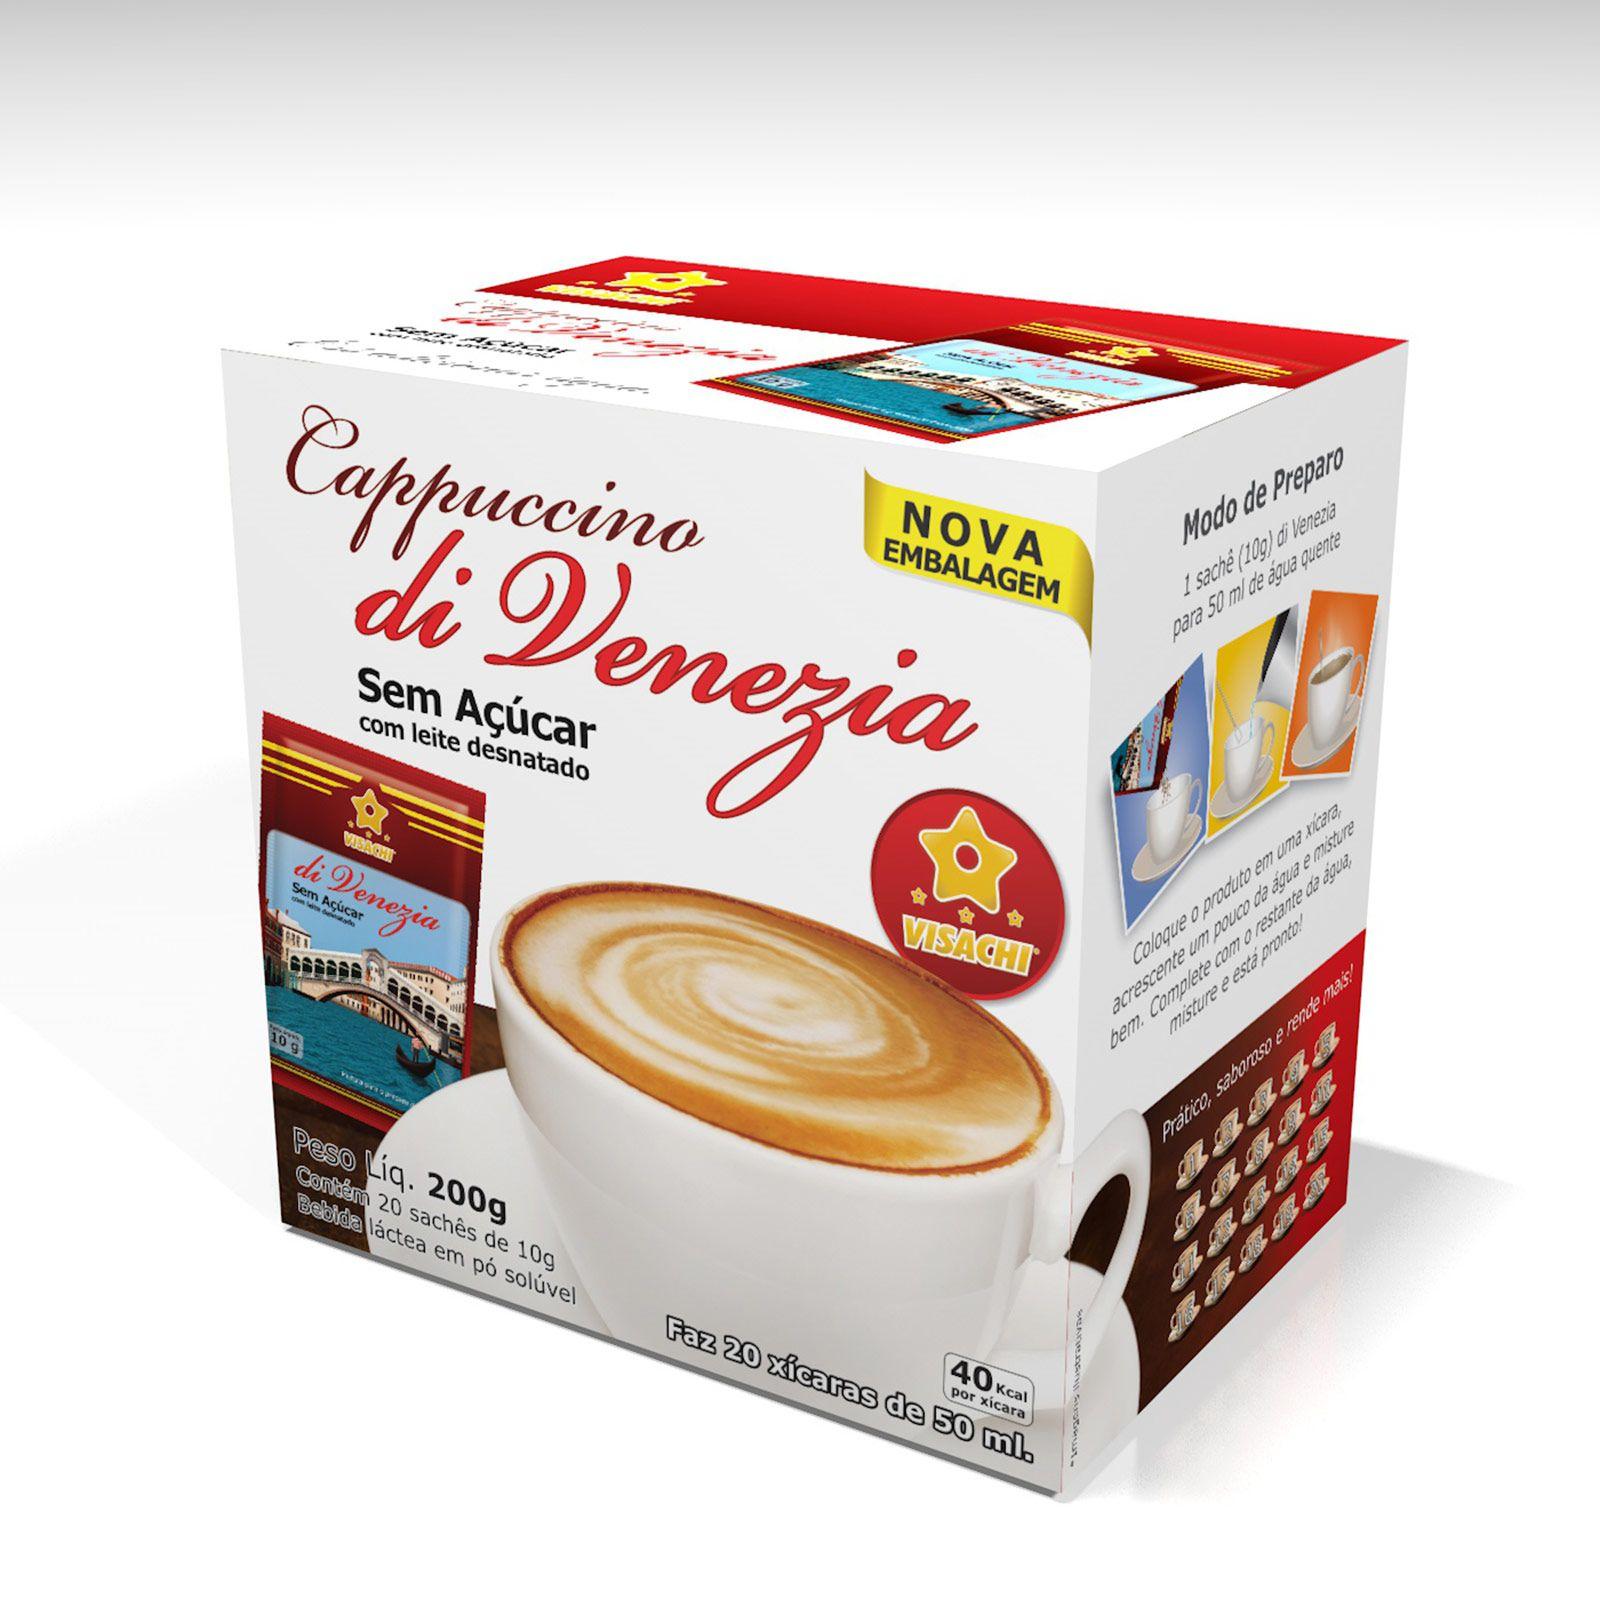 Mini Box Cappuccino Tradicional sem açucar di Venezia Sachês - 20 unidades  - Visachi Alimentos